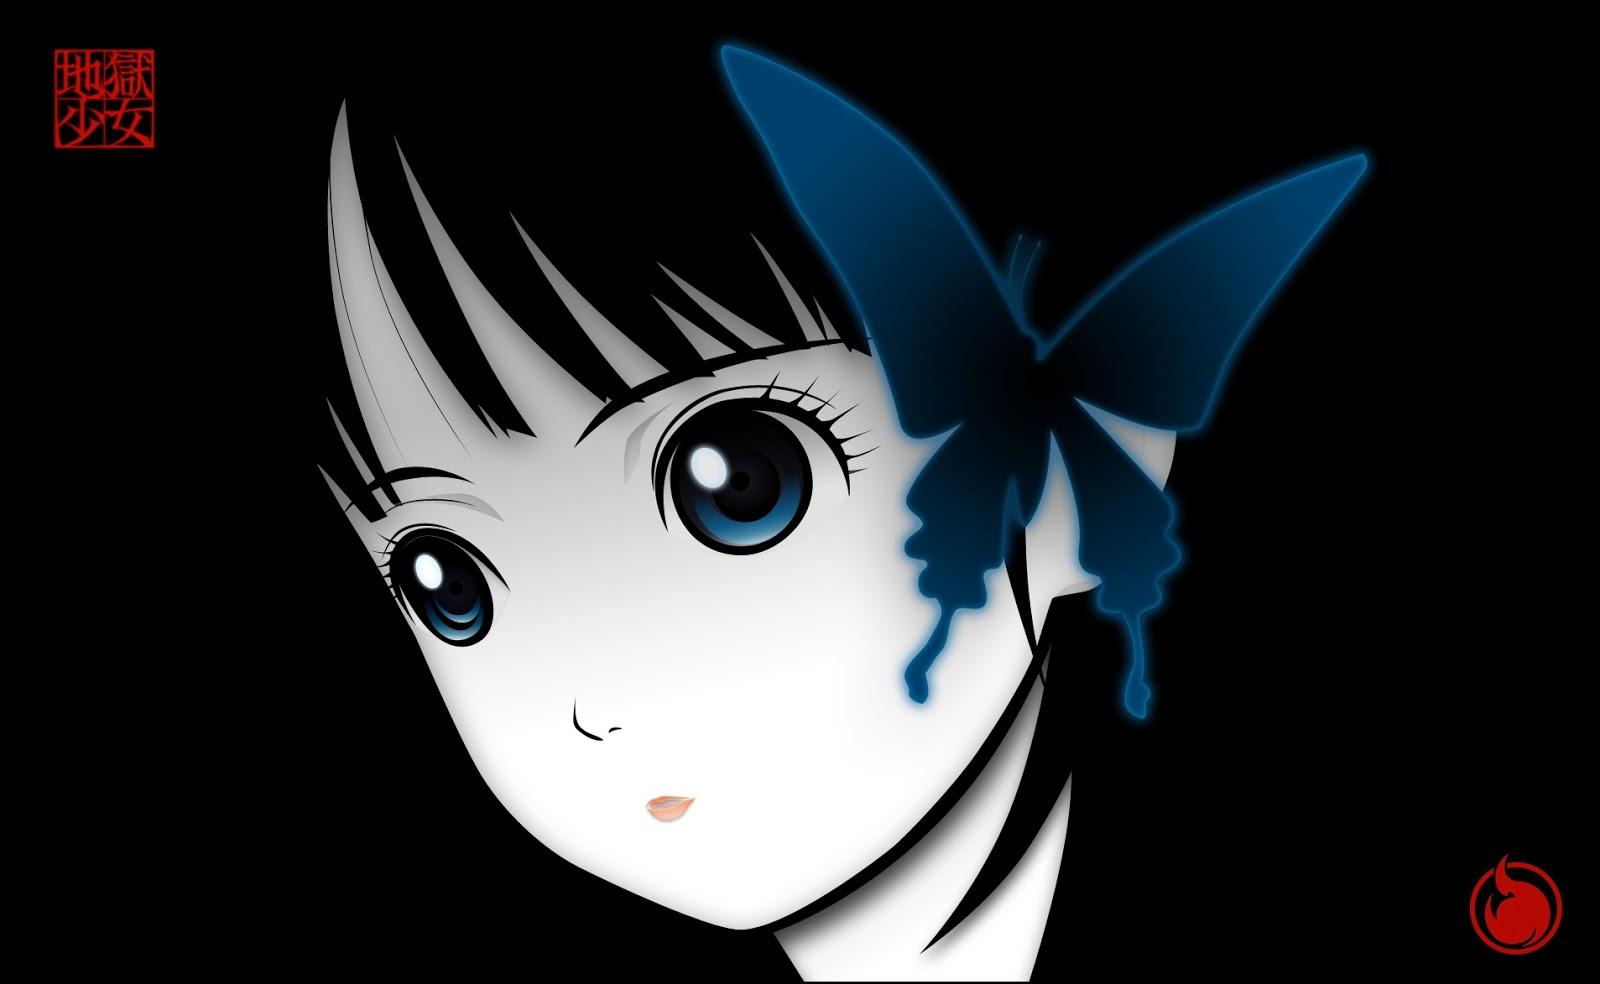 Free Wallpaper Anime HD Keren Terbaru Deloiz